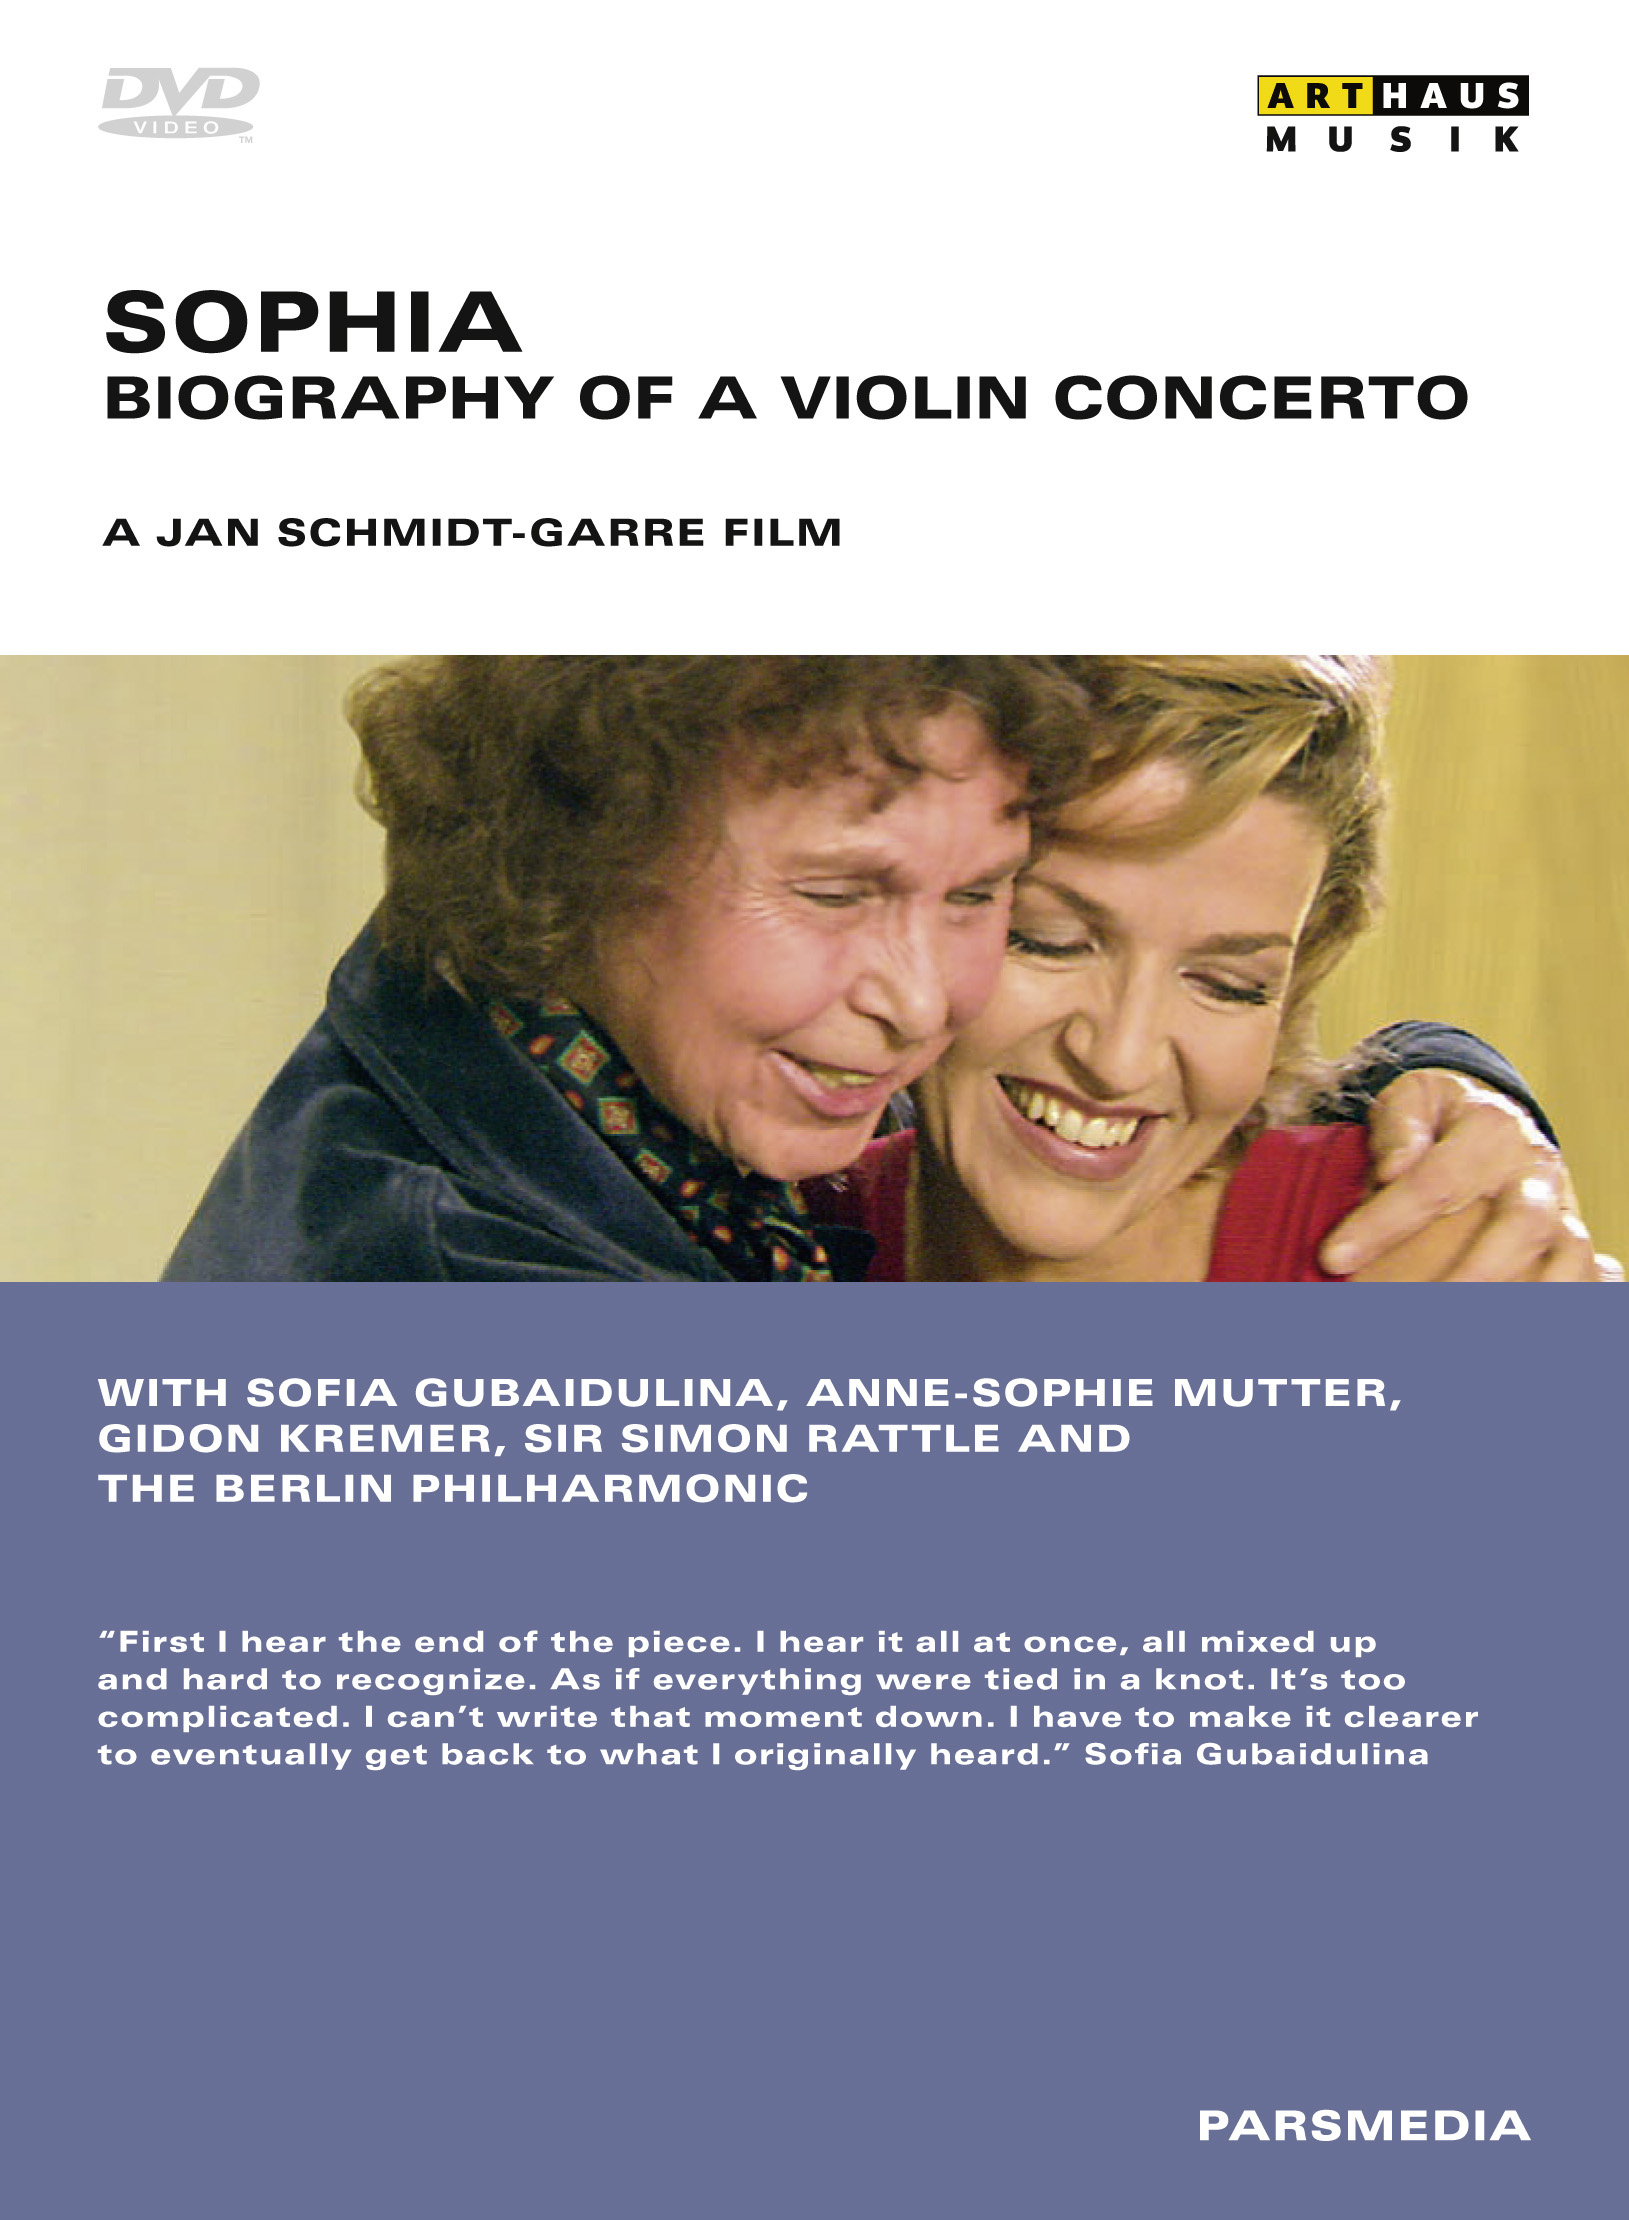 Bildresultat för Sophia – Biography of a Violin Concerto. Arthaus.